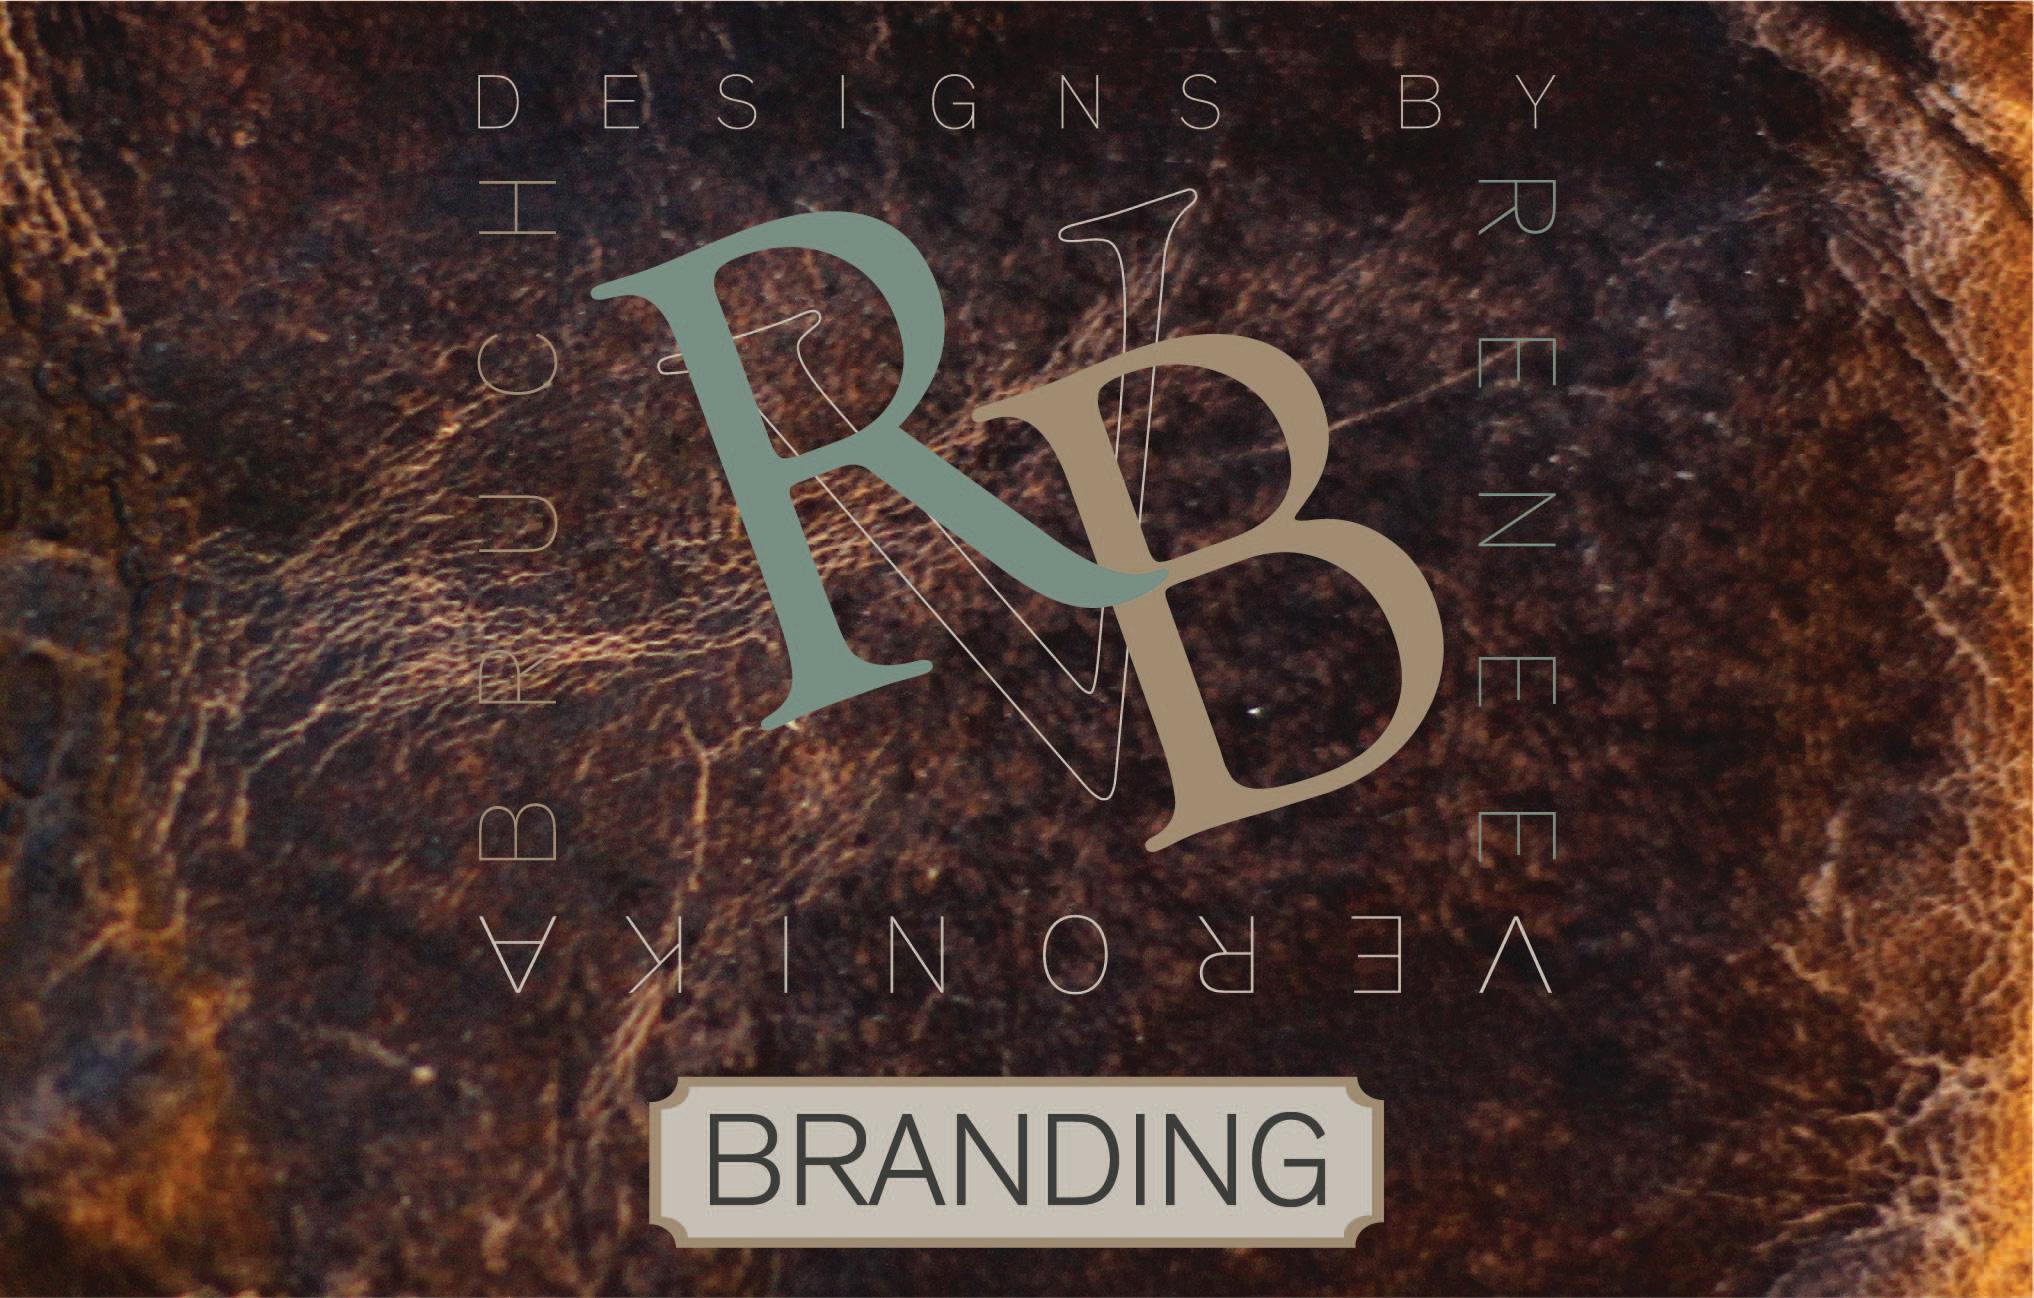 DesignsByRVBLogo_Cover